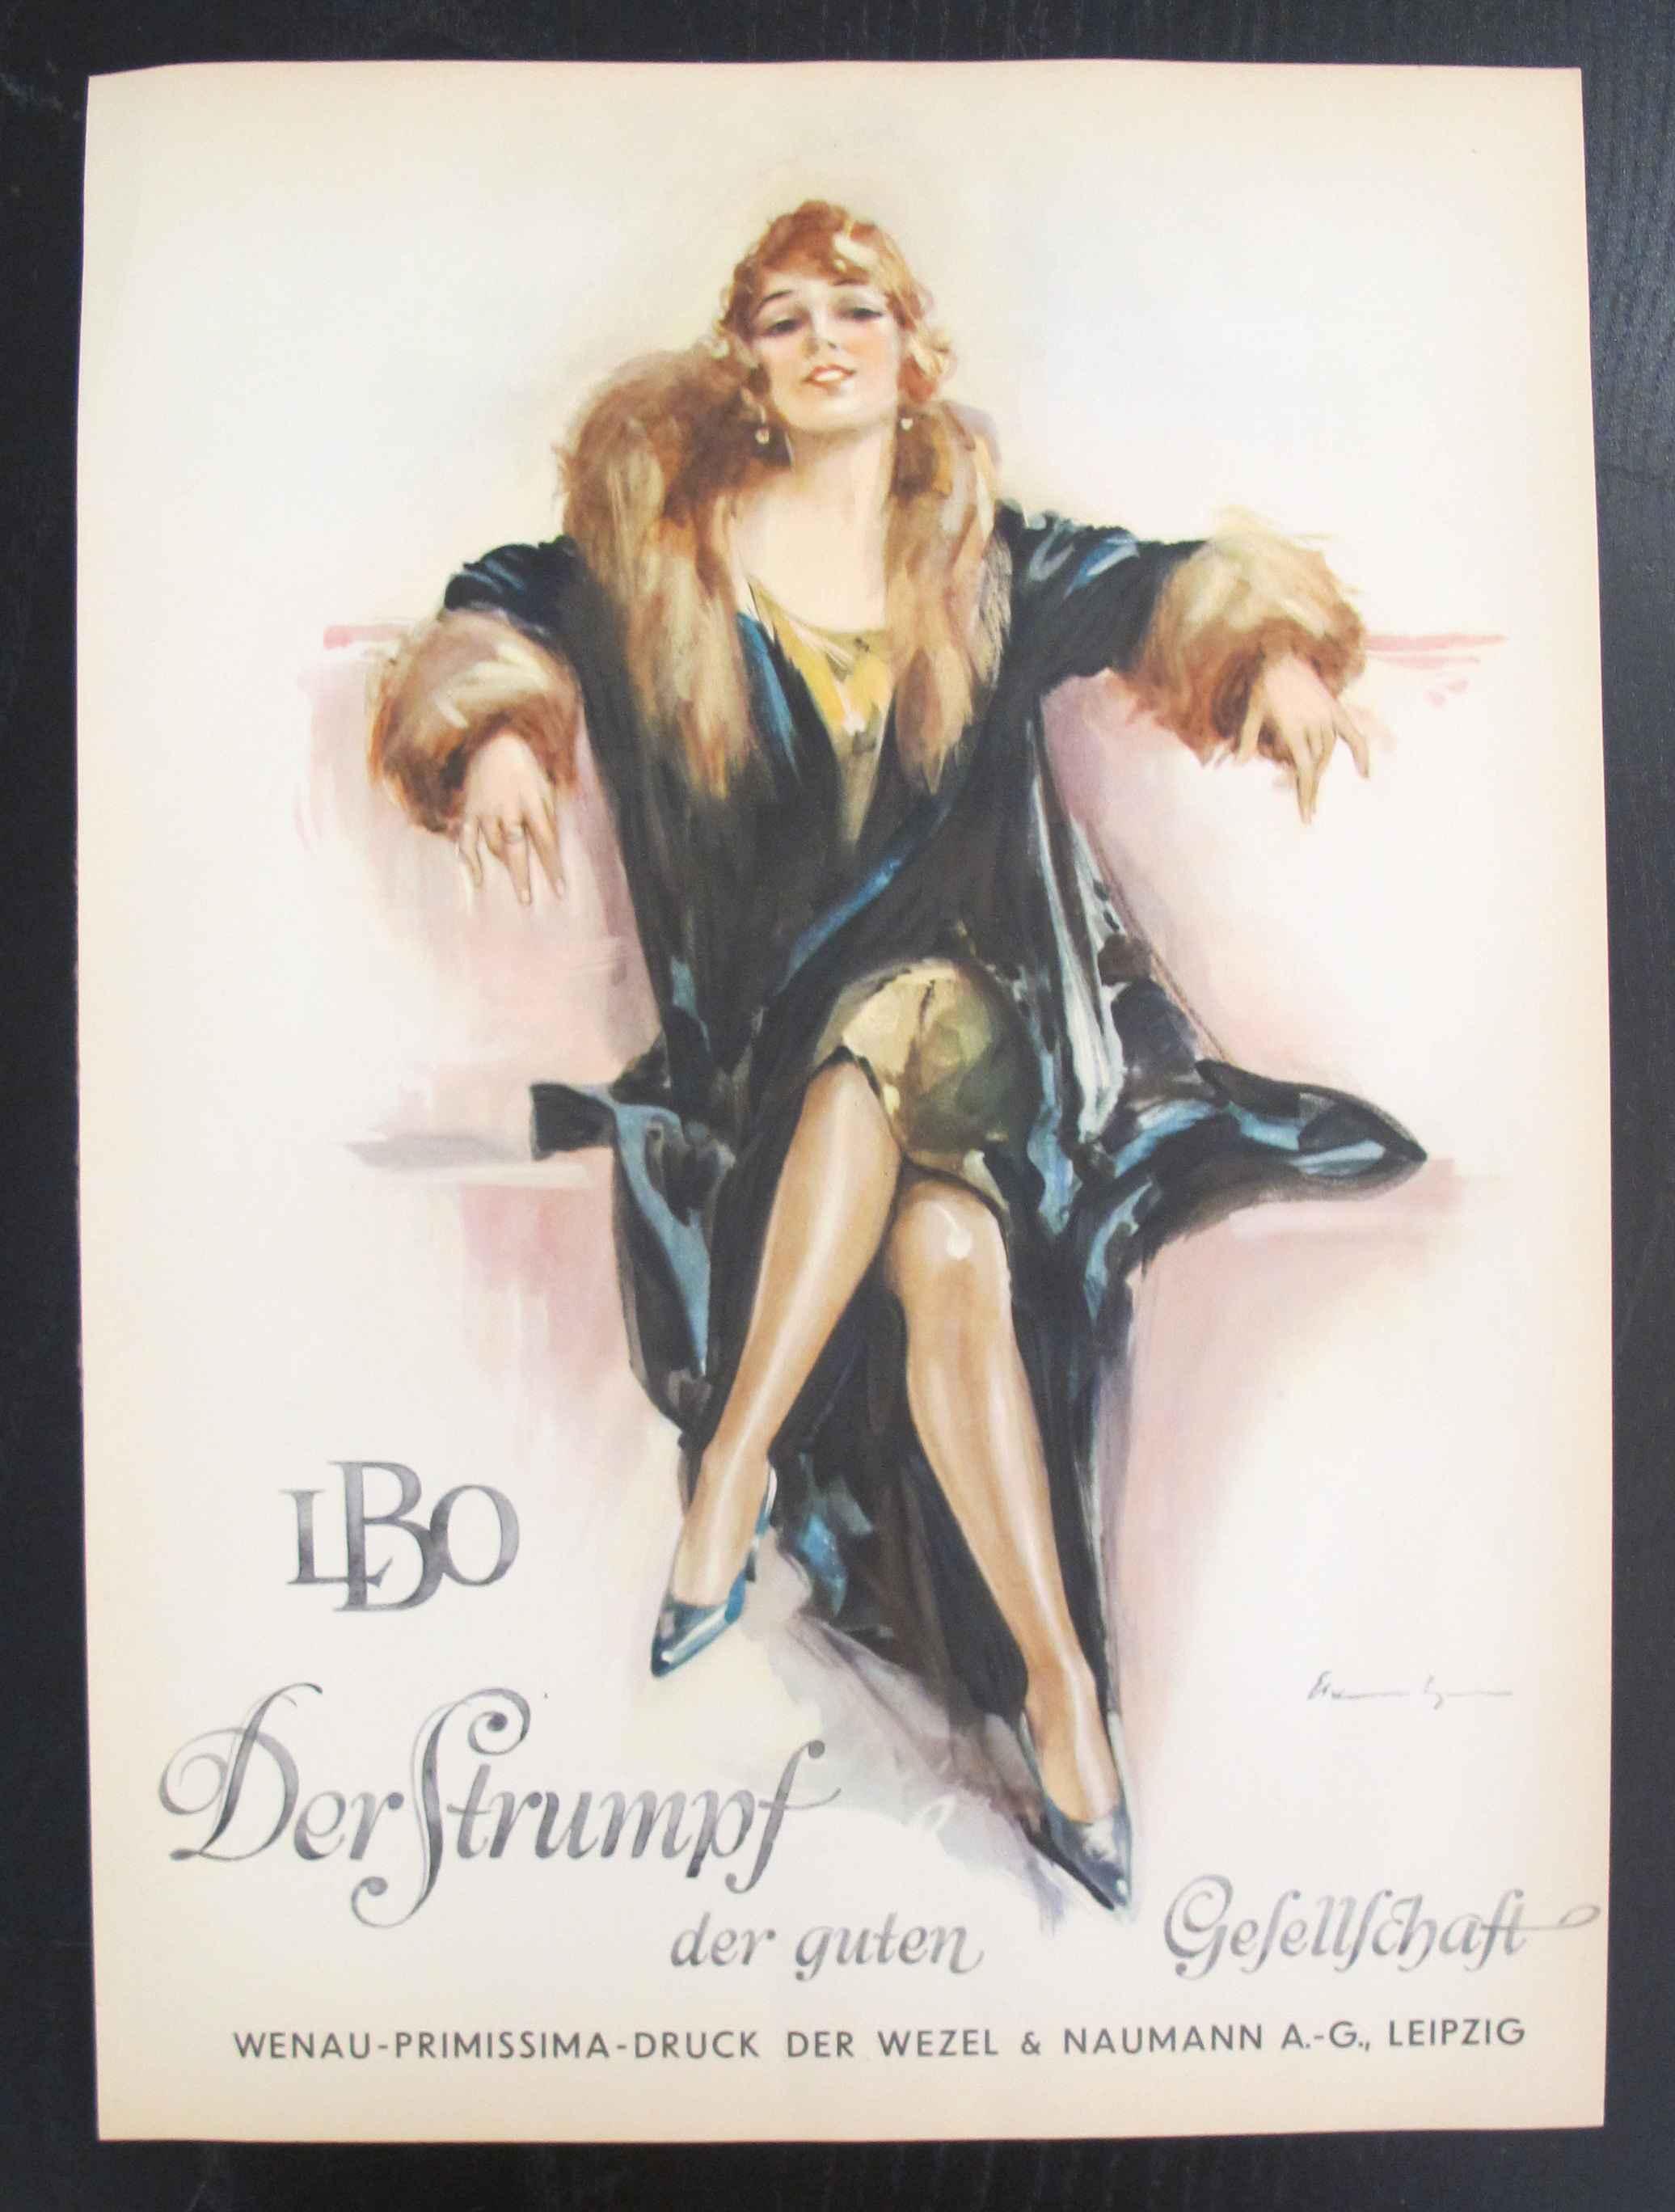 LBO Derstrumpf Orig... by  Ludwig Hohlwein - Masterpiece Online